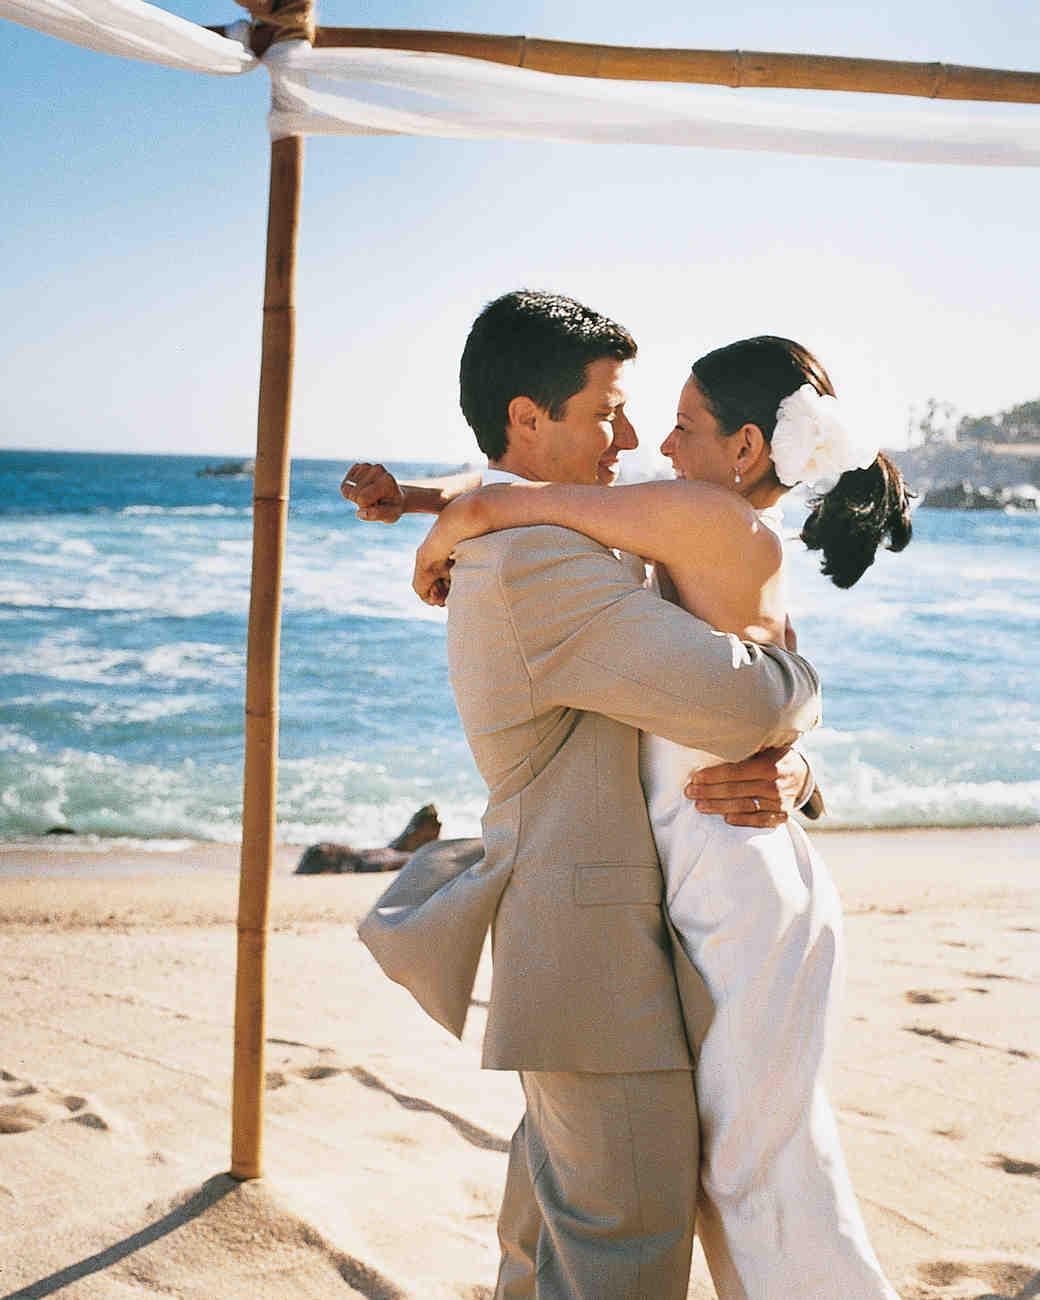 john-dolan-wedding-photographer-summer-2006-0914.jpg